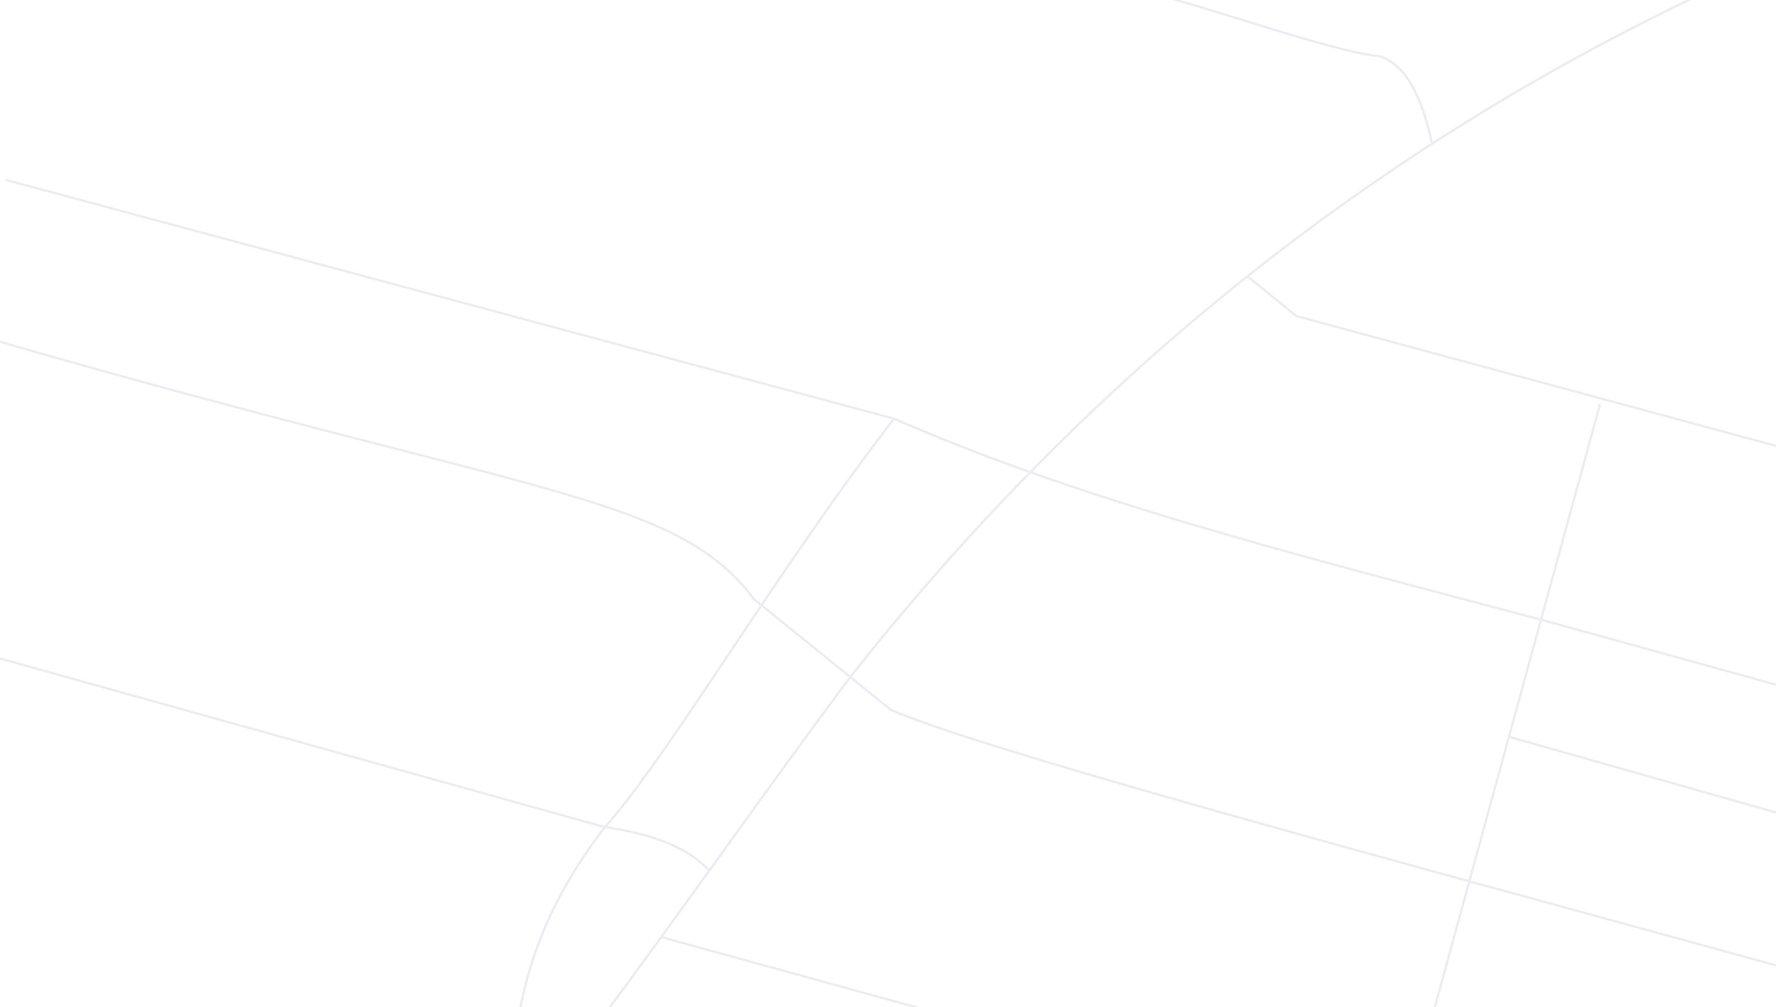 i'mstillhere_MAP_wide%20copy_edited.jpg